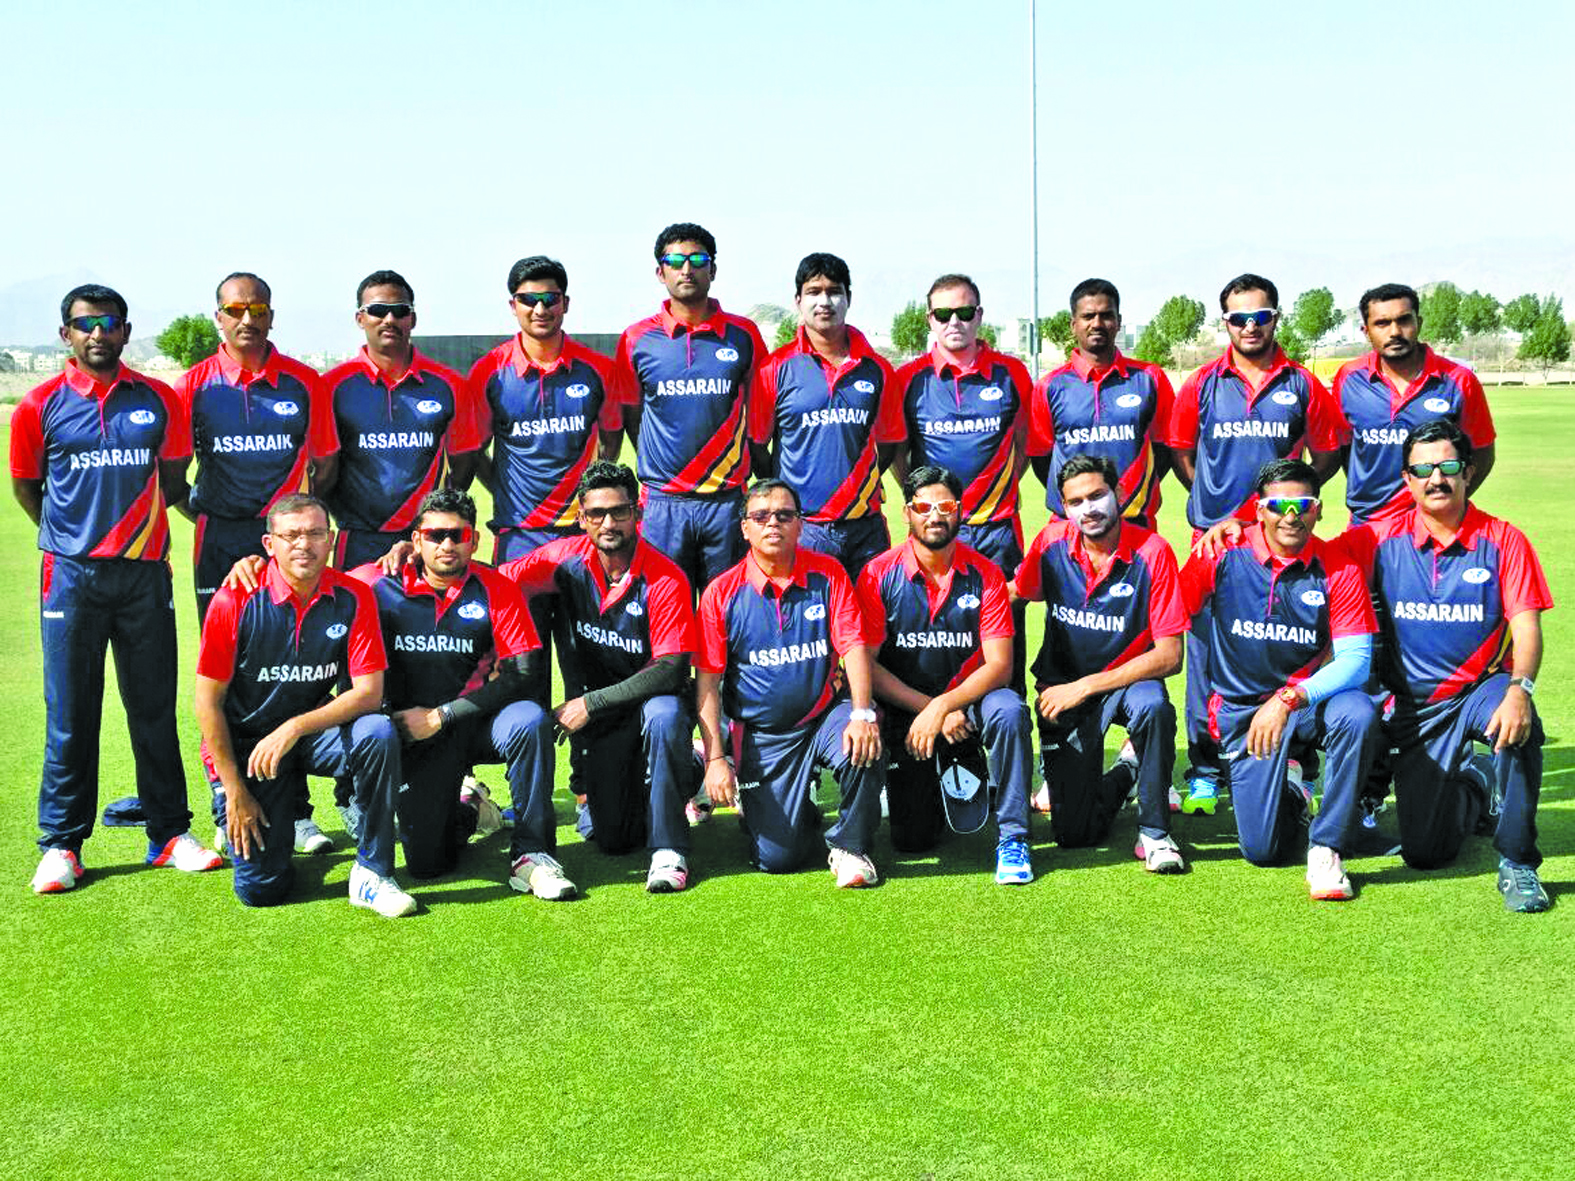 Assarain record victory as Oman Cricket new season kicks off in style